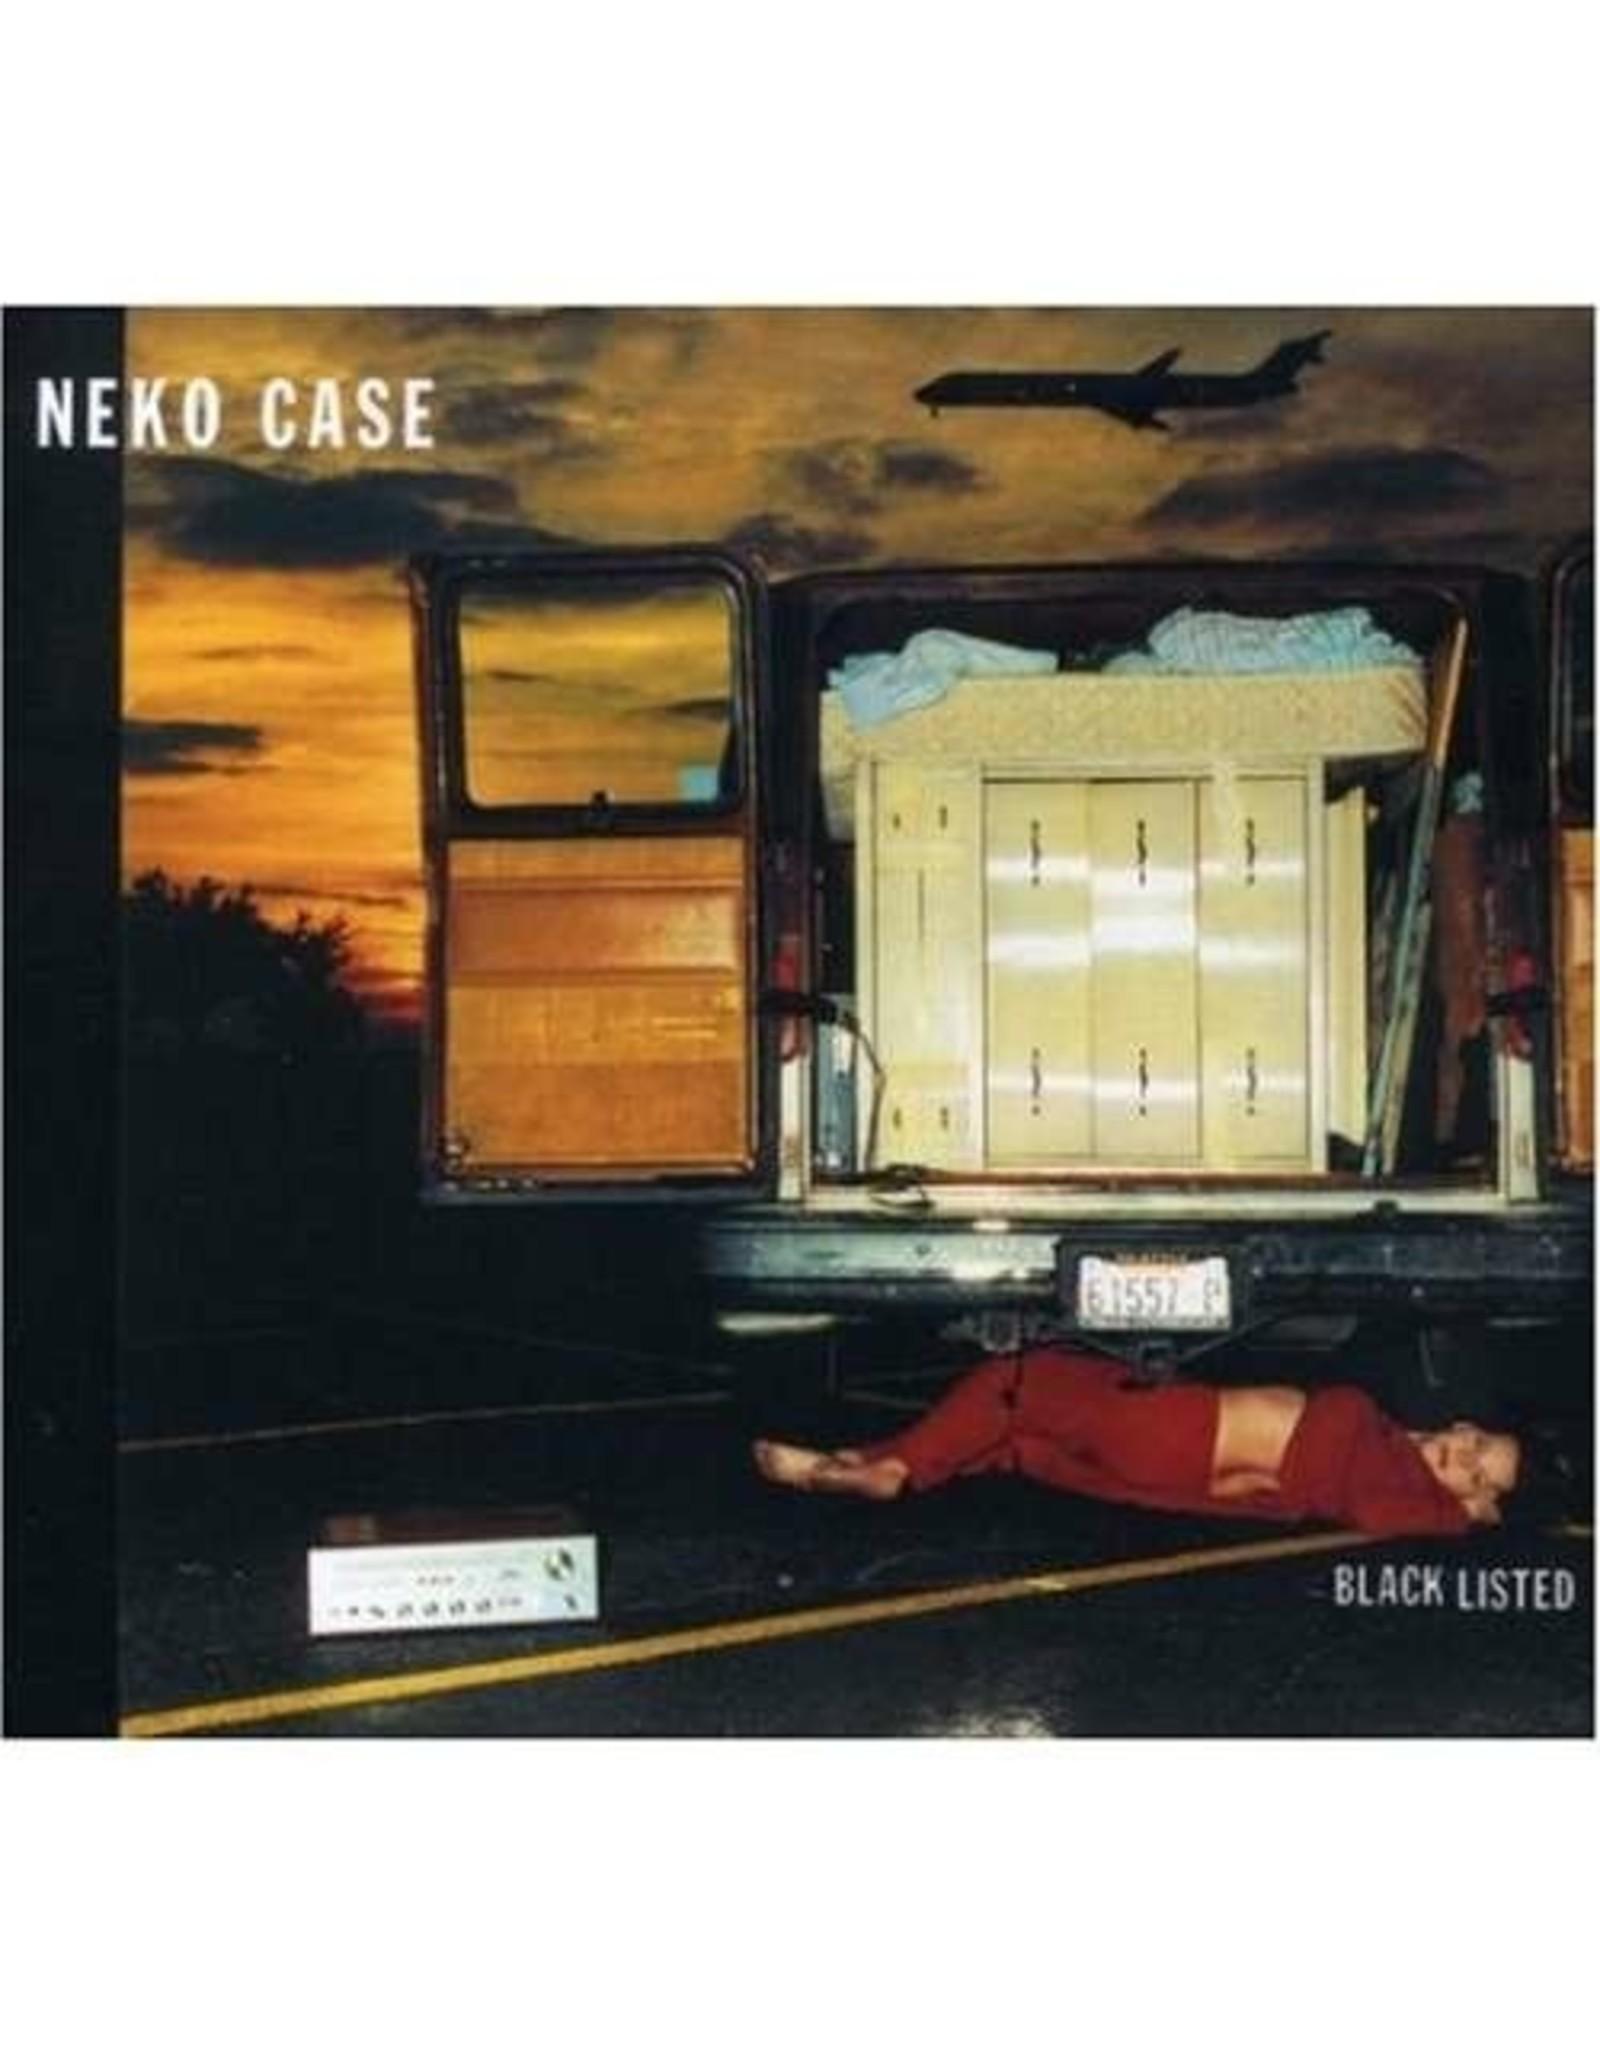 New Vinyl Neko Case - Blacklisted LP